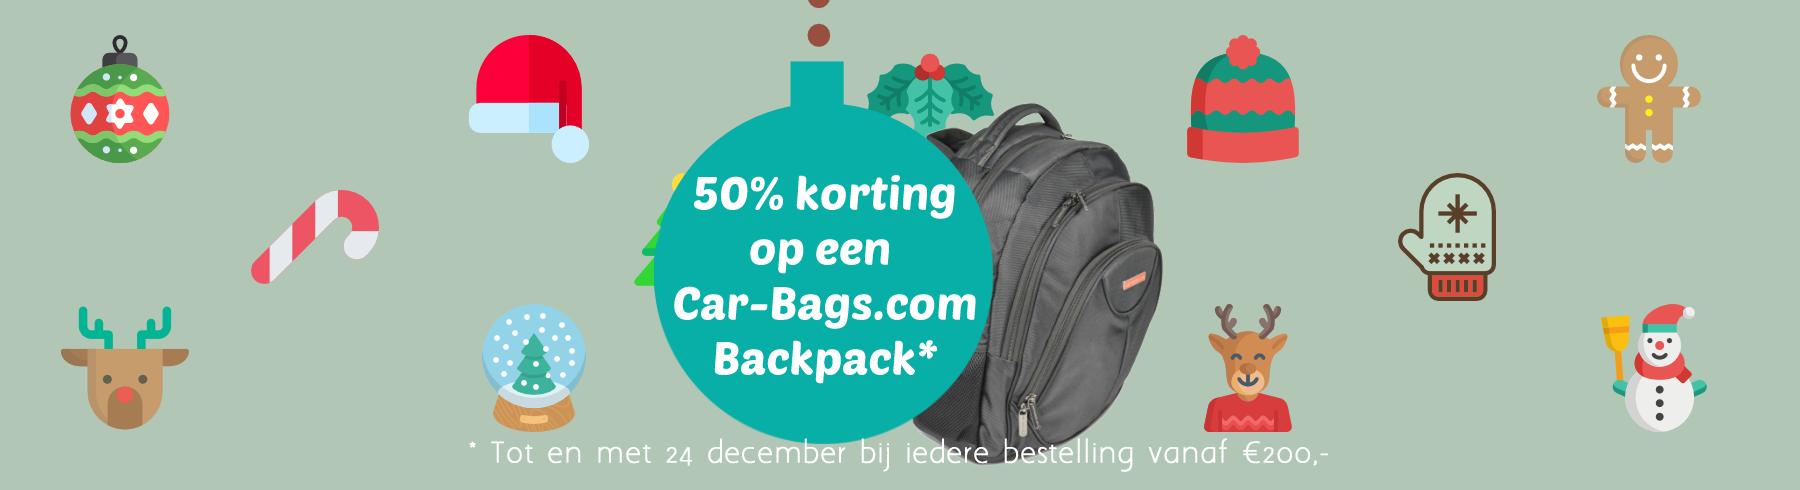 backpack-korting-nl2